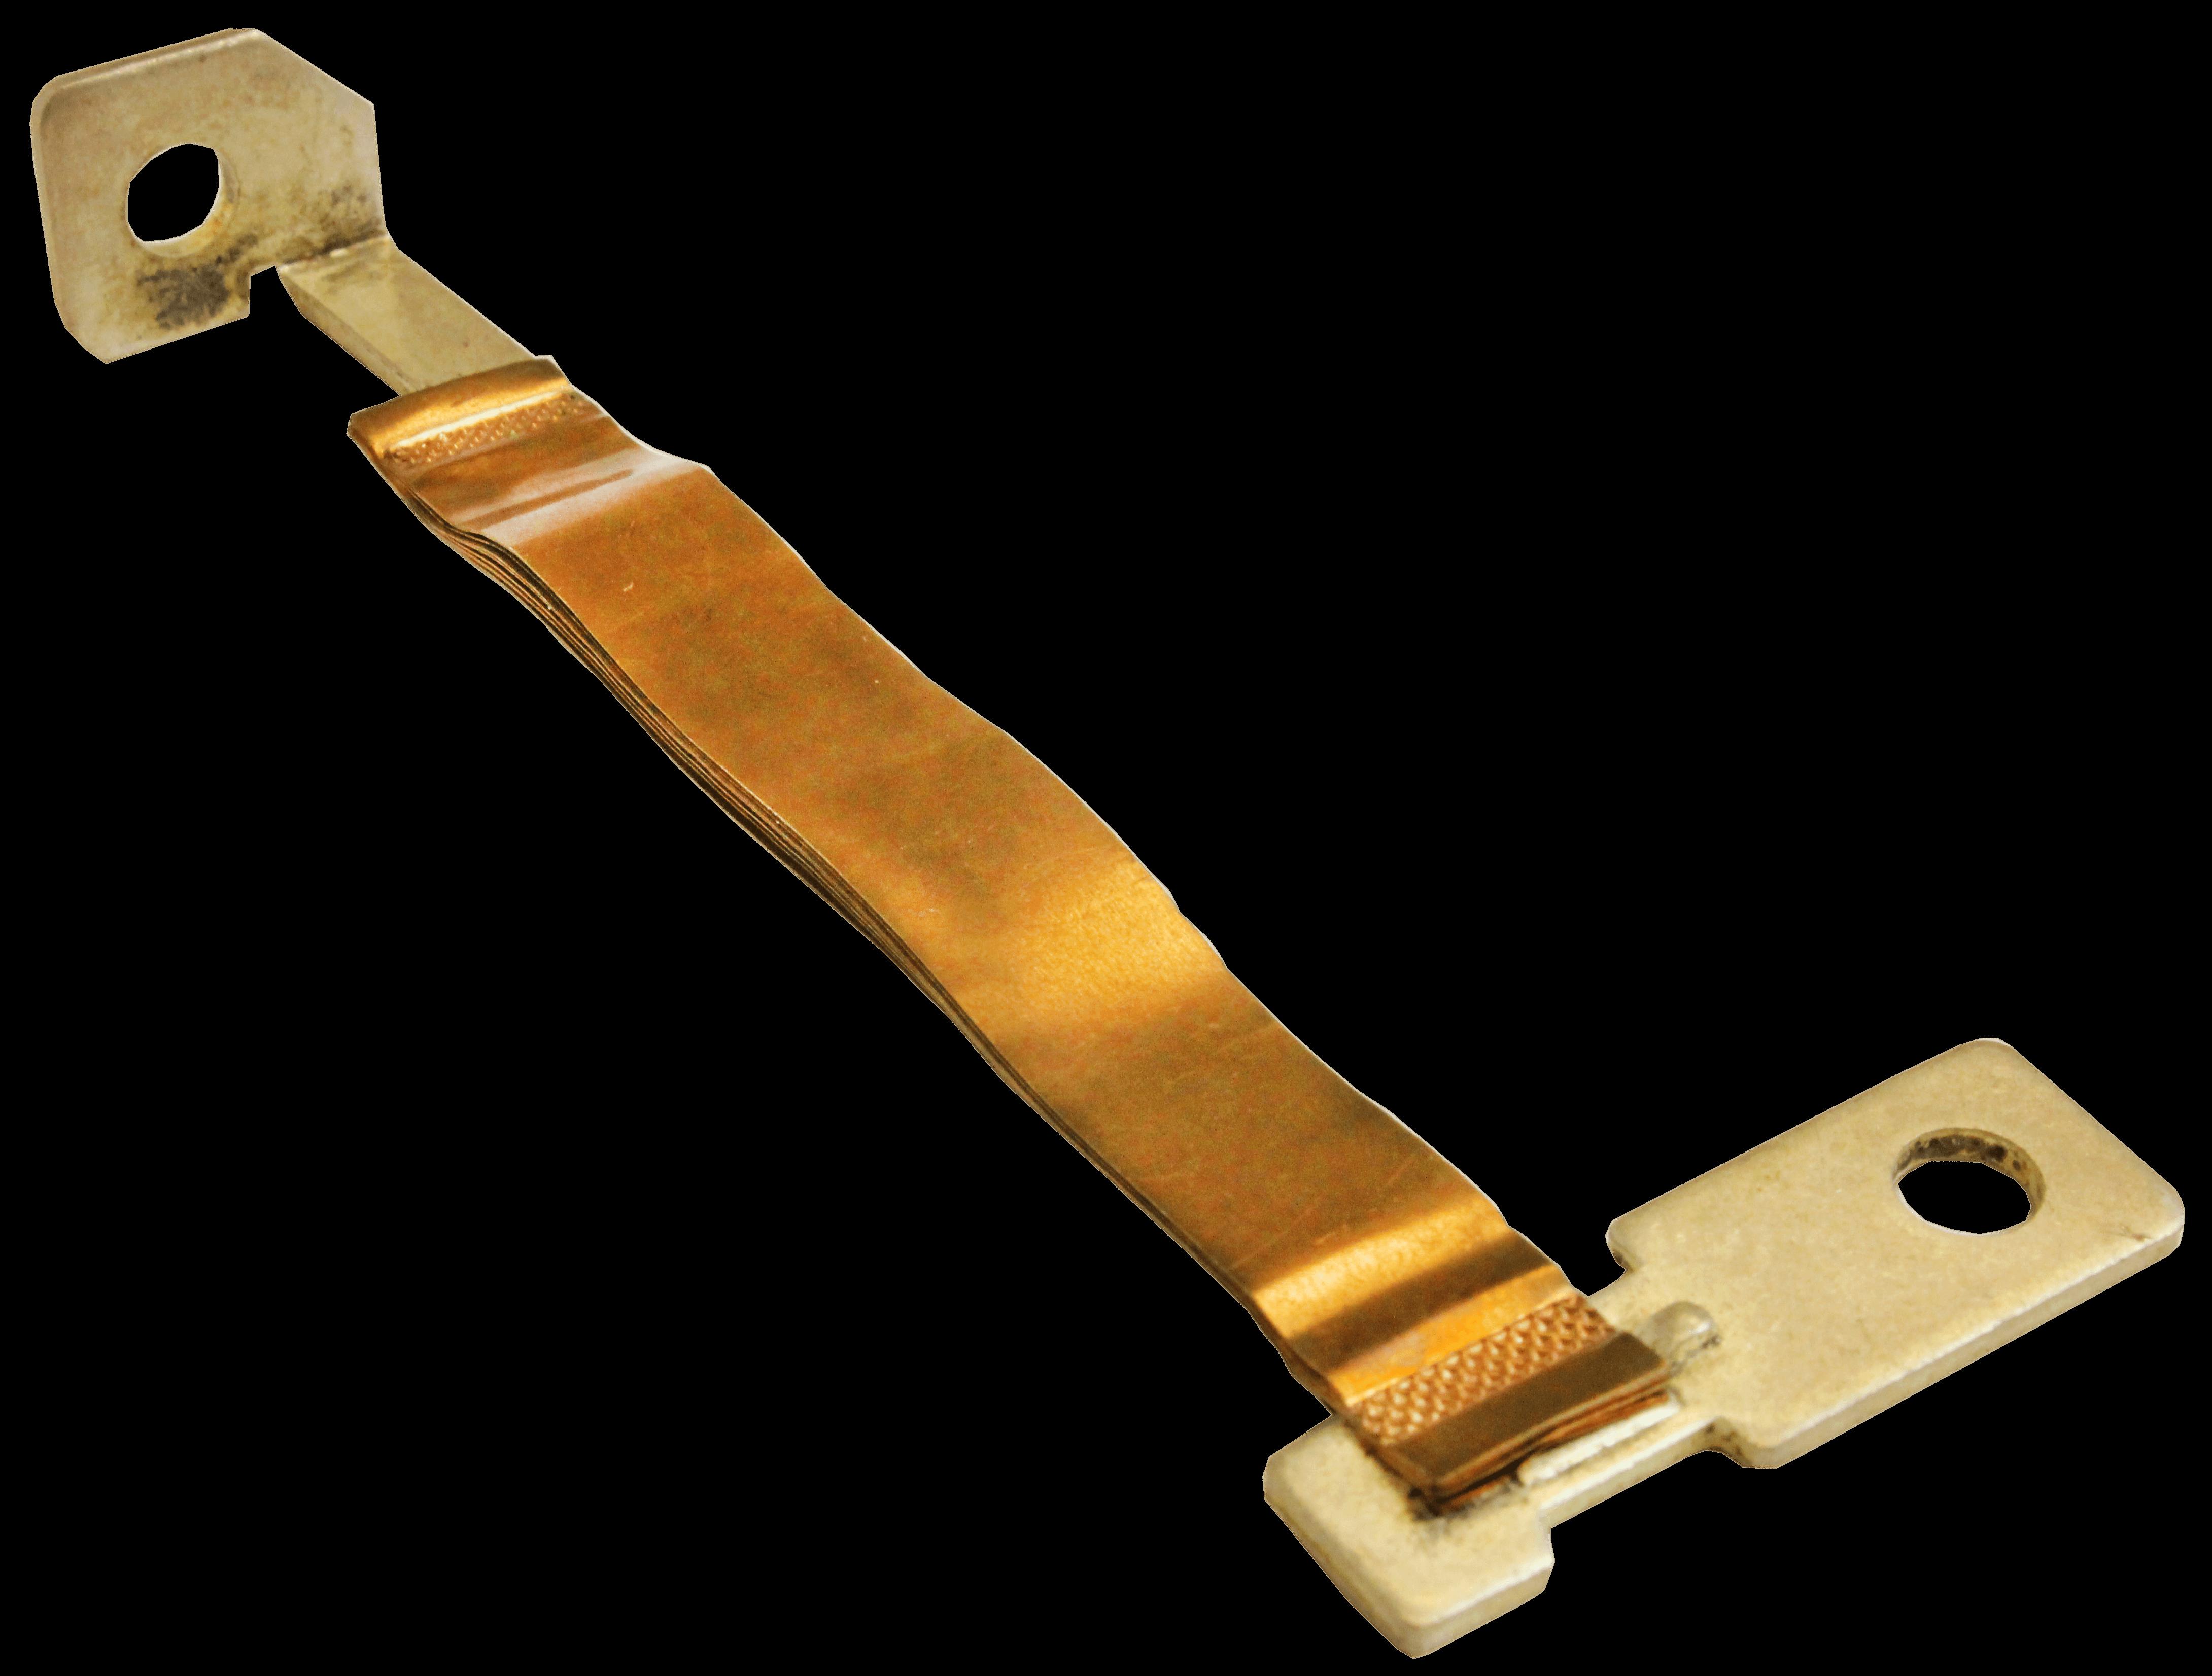 Ultrasonic spot Welder foil to terminal weld sample